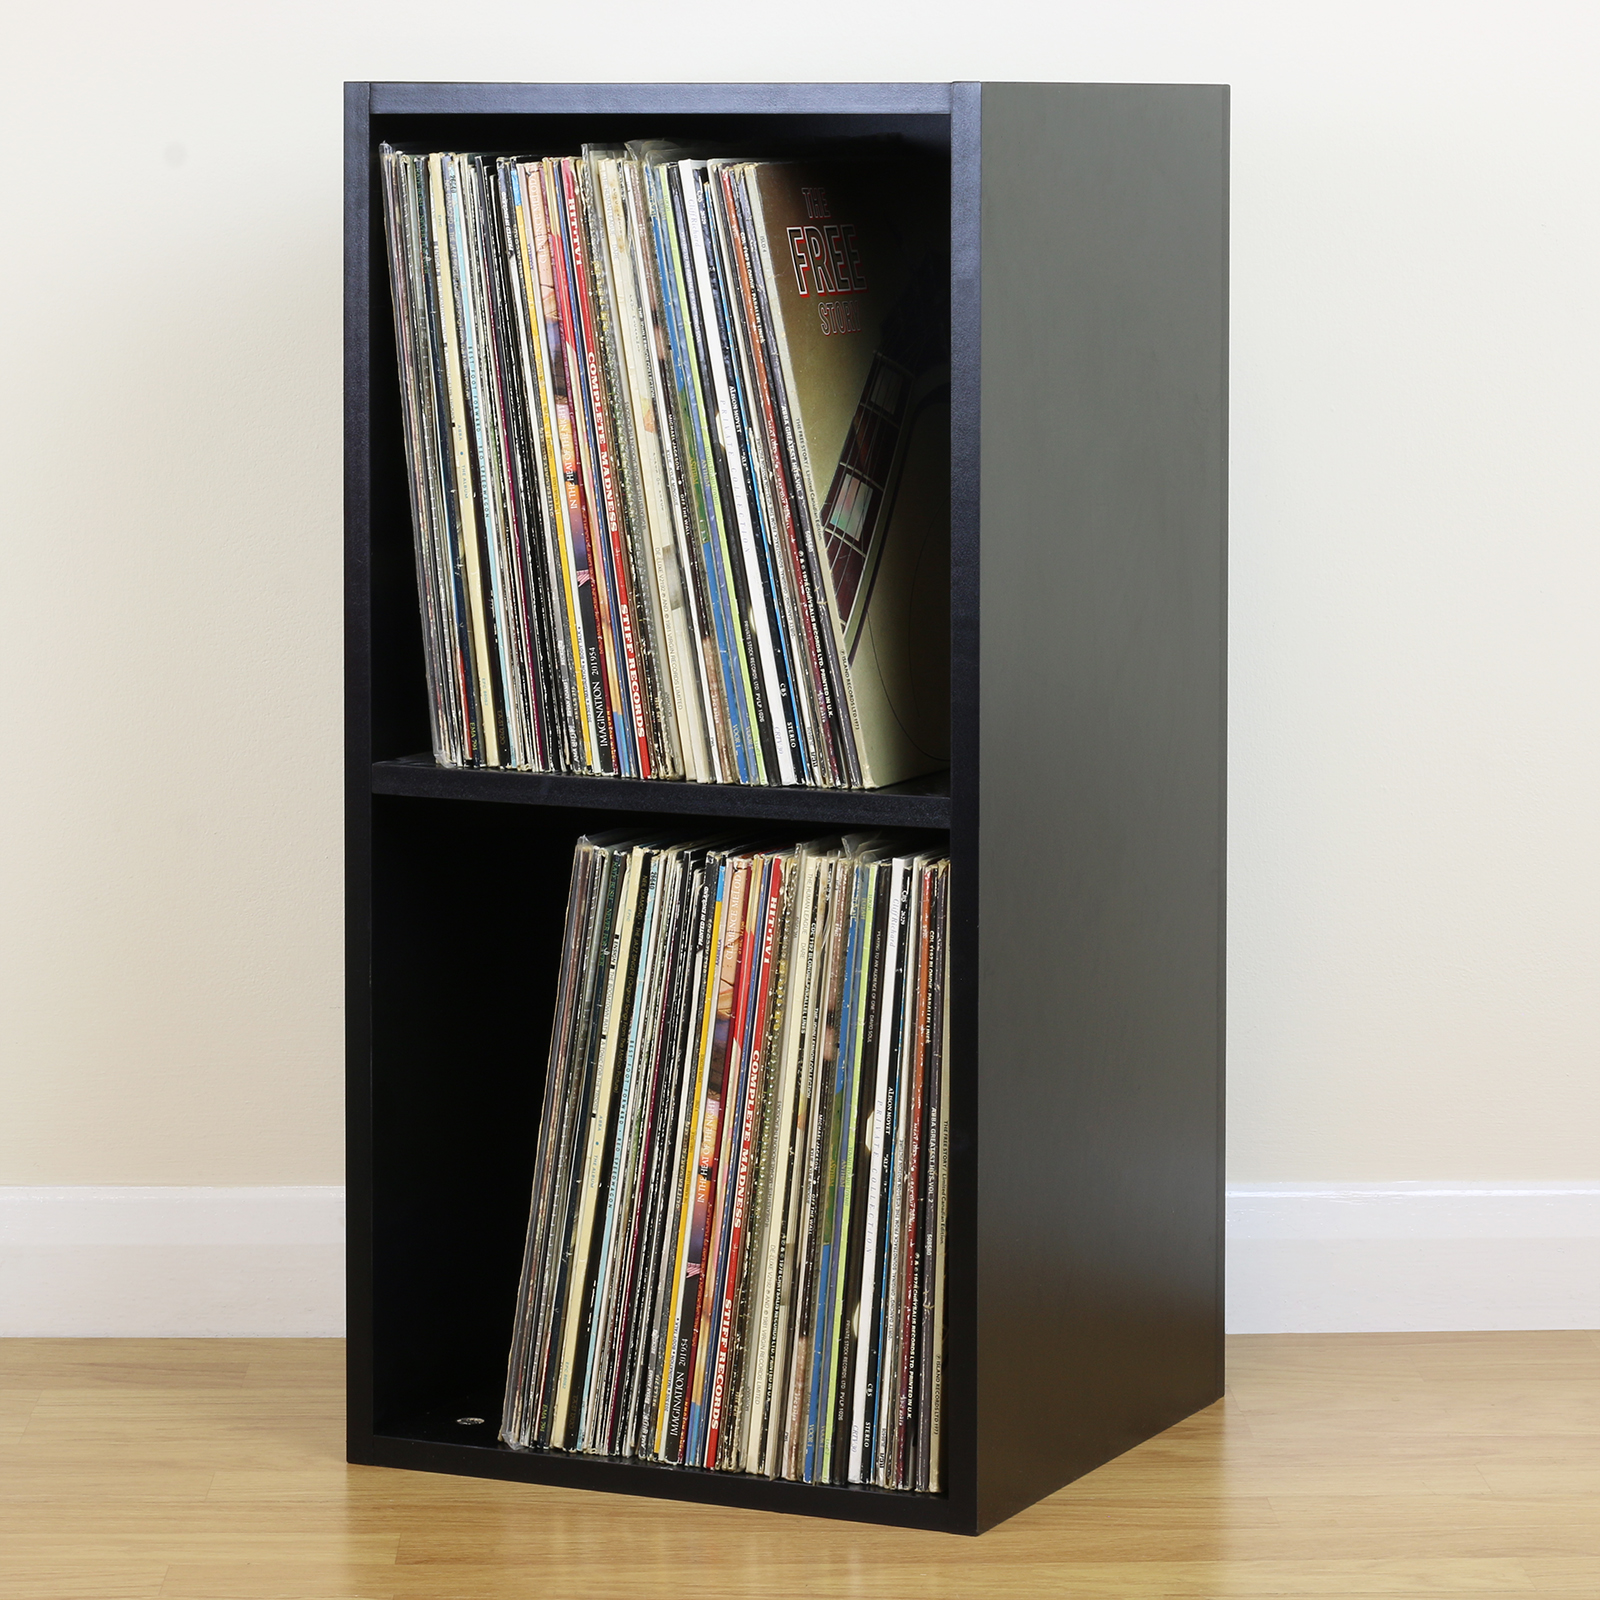 Best vinyl lp storage options uk